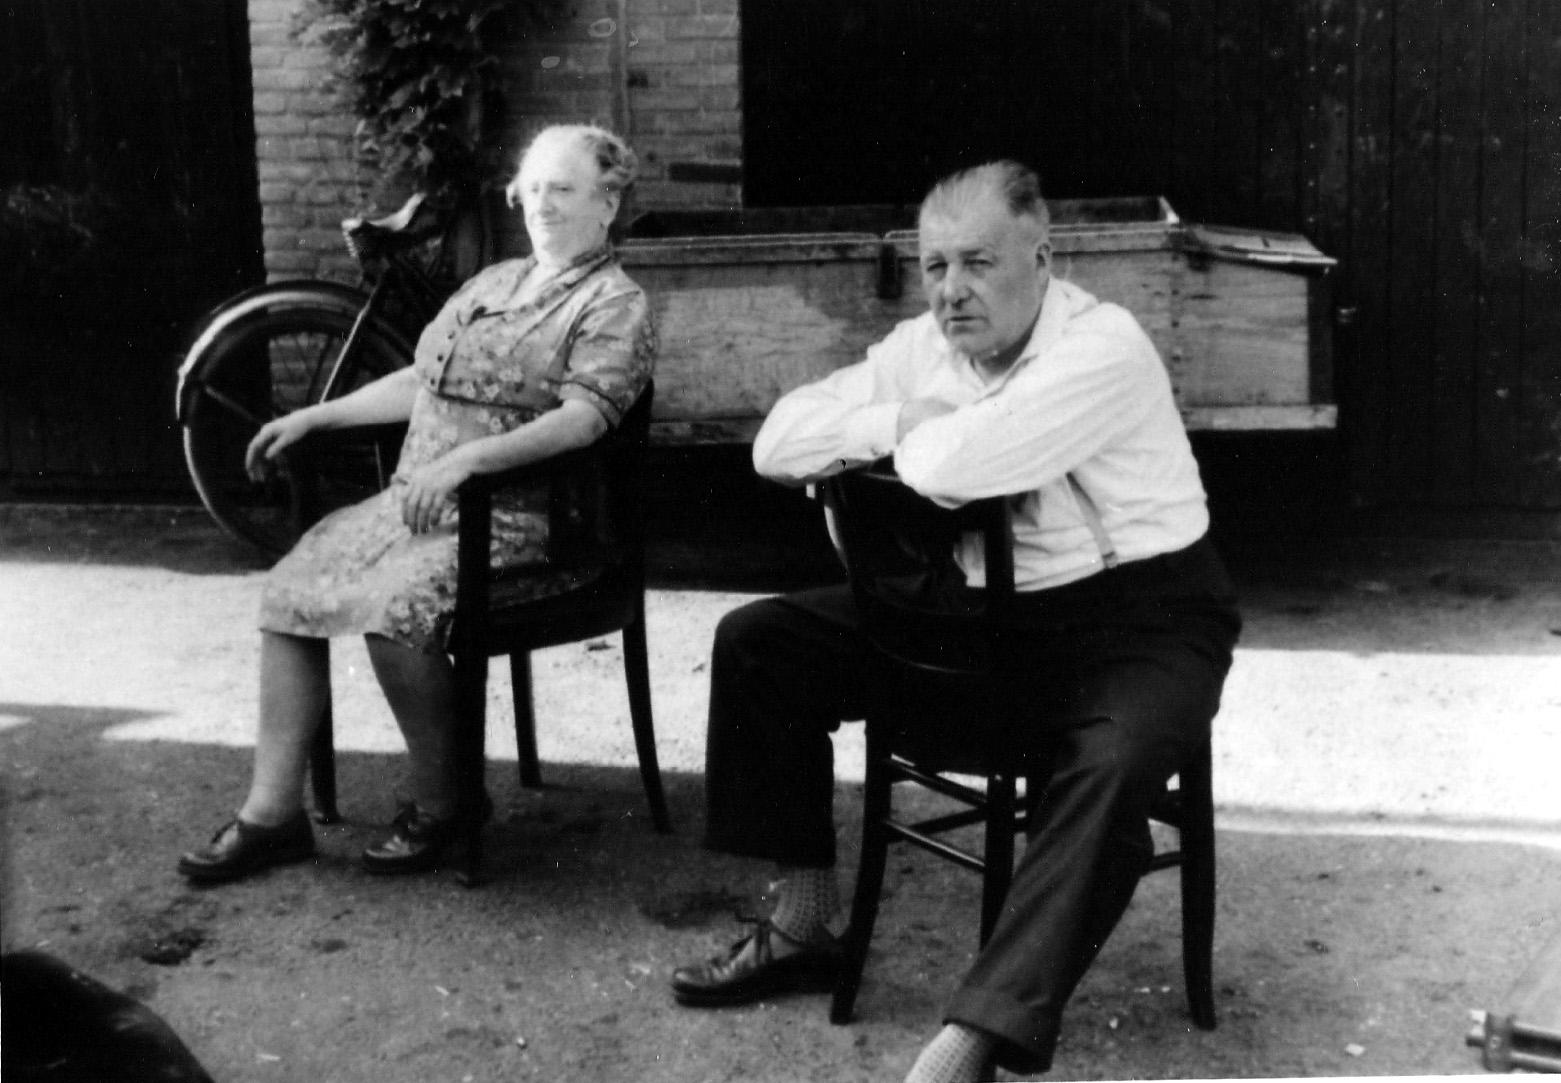 ca1960 Jan van Osch 1908 +1968 en Grada Knicknie 1894 +1980